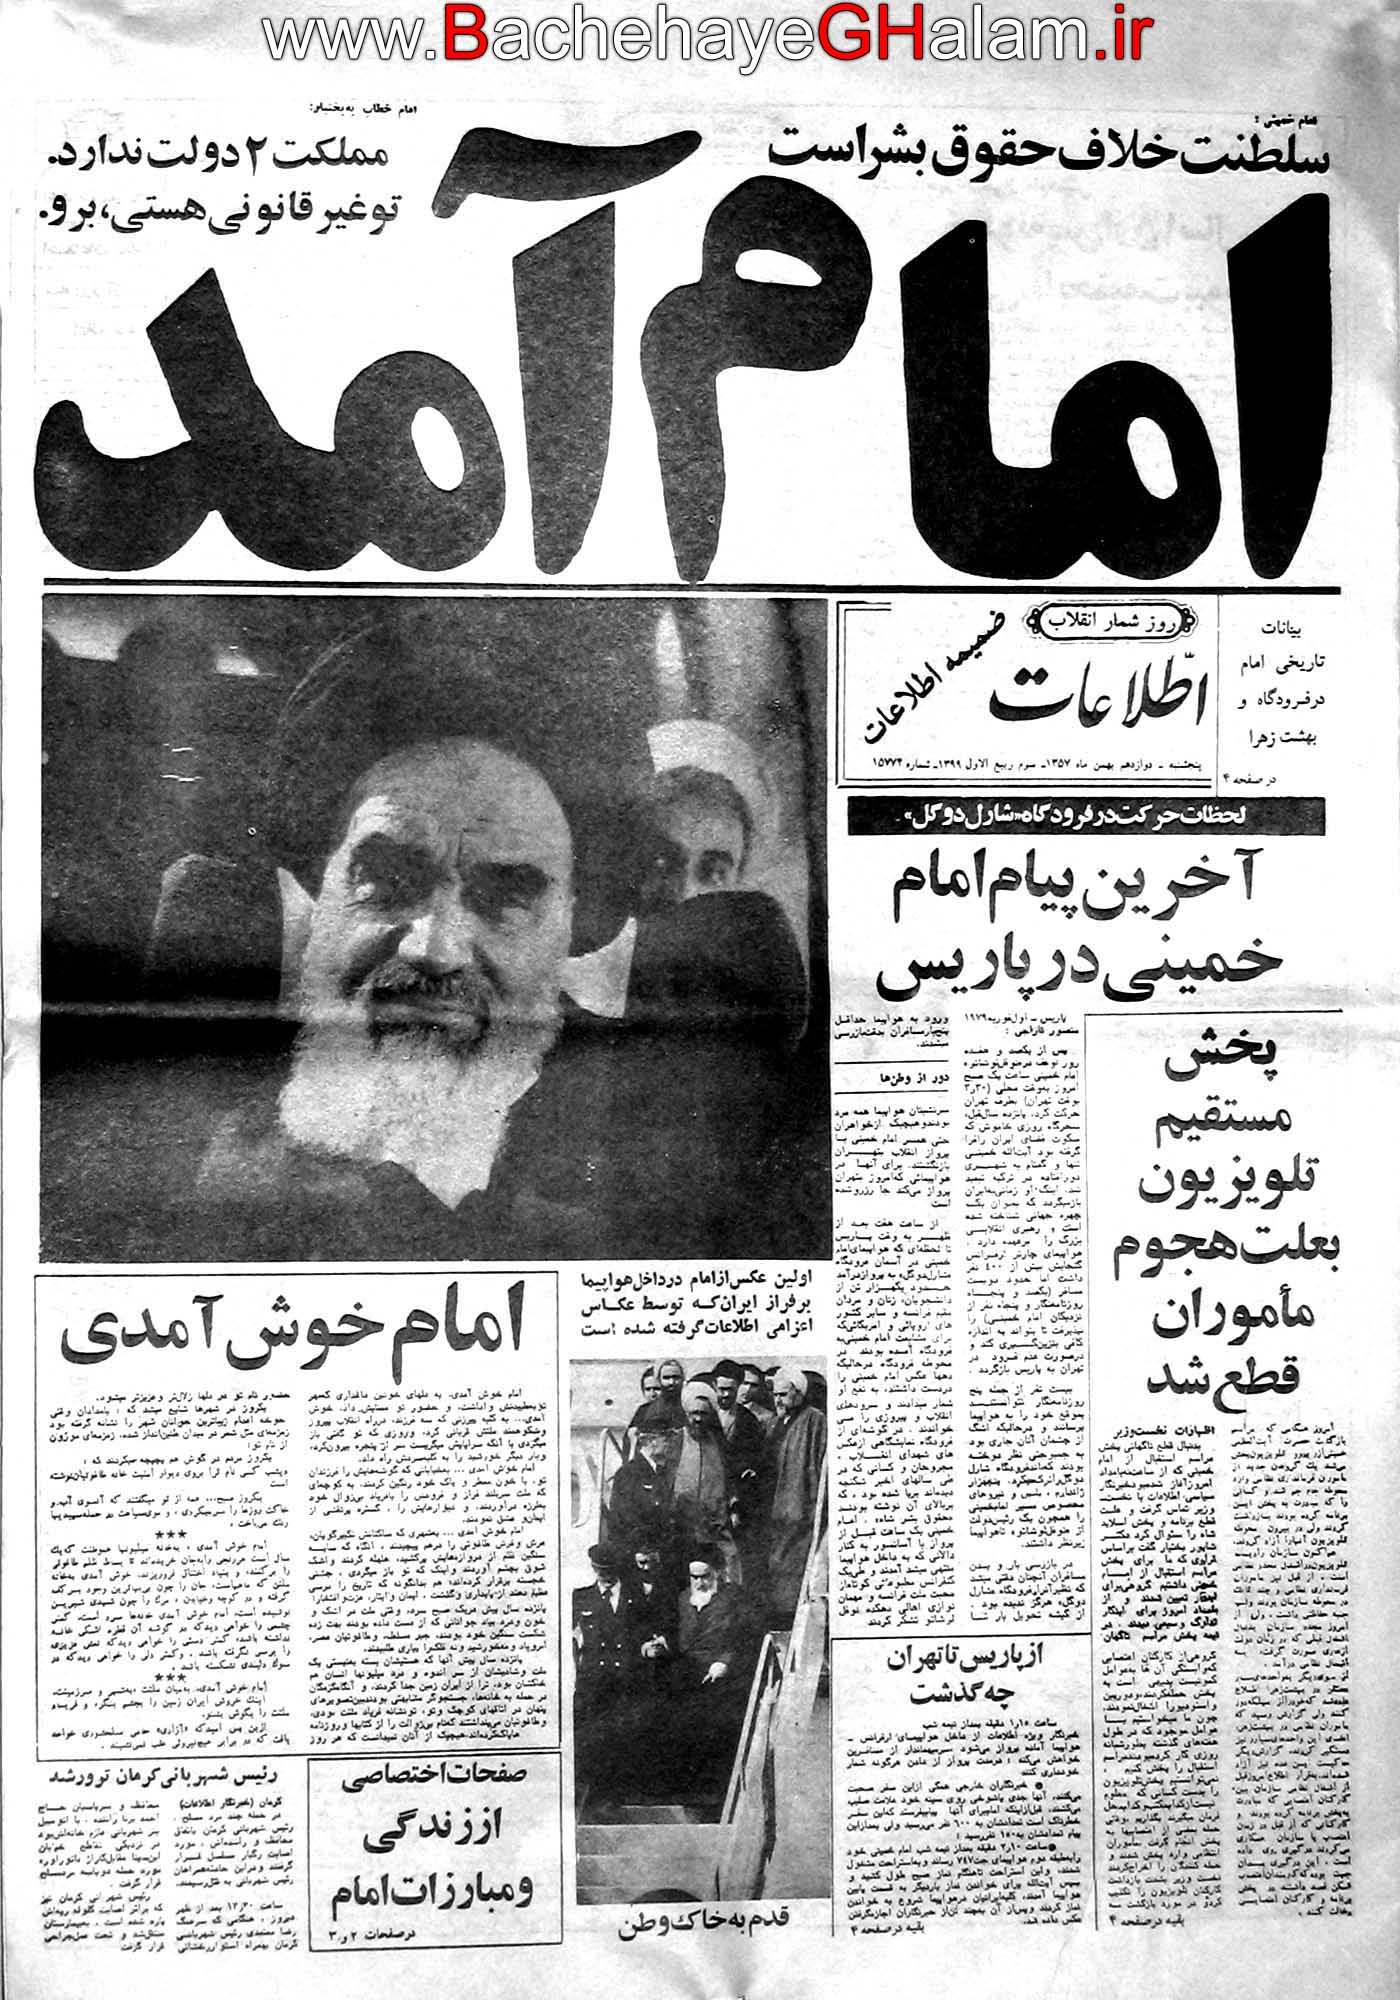 http://bachehayeghalam.ir/images/enghelab/12-bahman-57.jpg